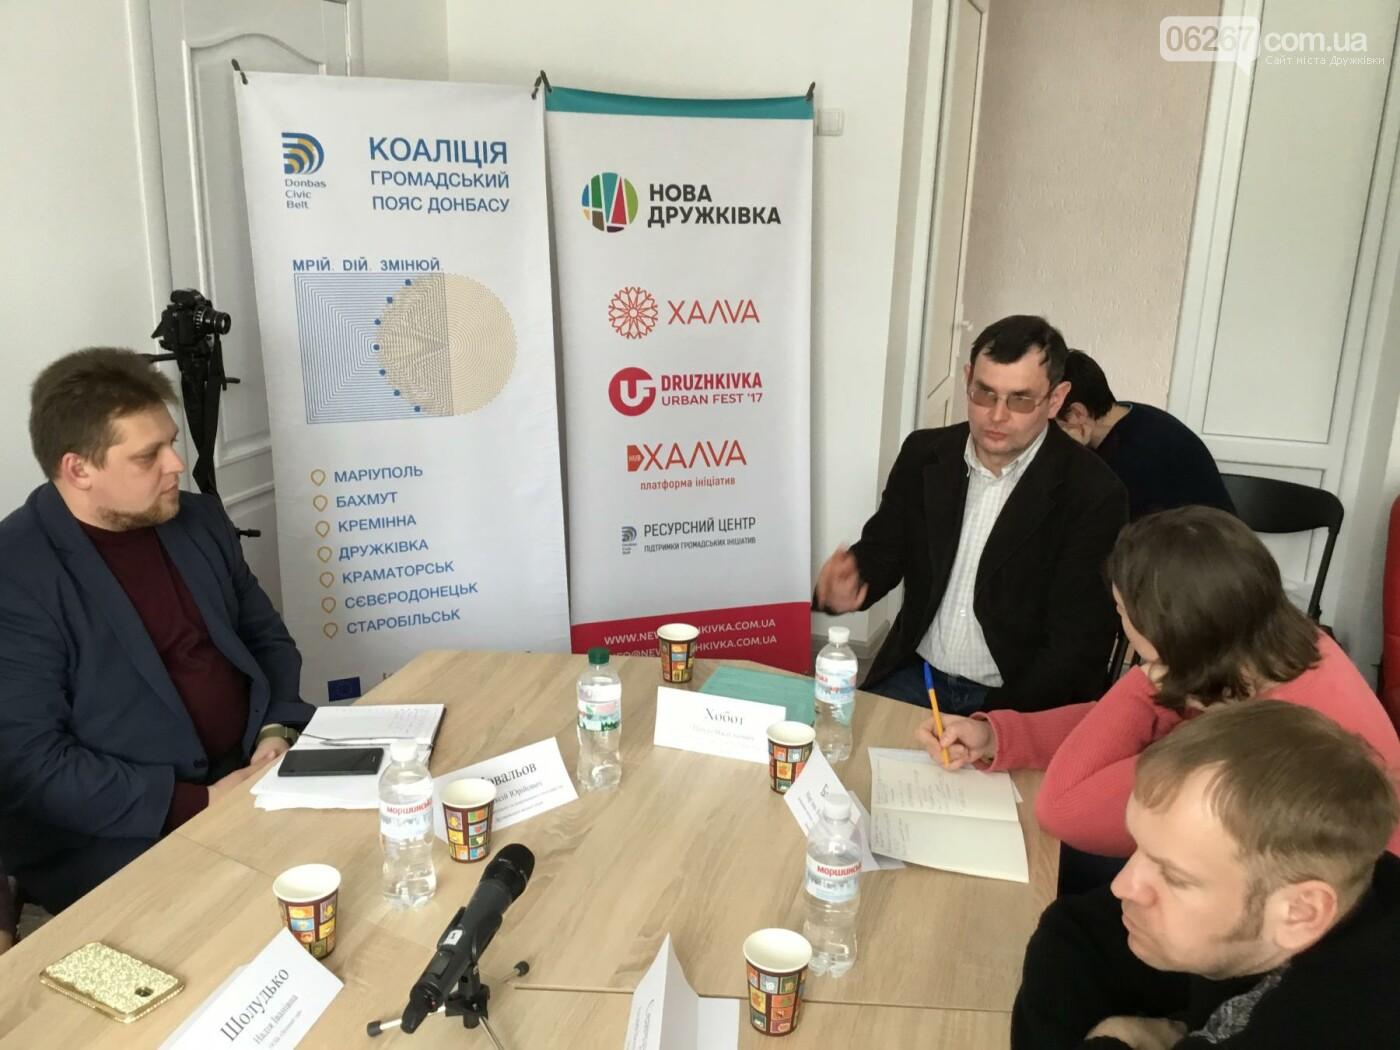 В Дружковке обсудили проблемы развития ОСМД в городе и области (ФОТО, ВИДЕО), фото-2